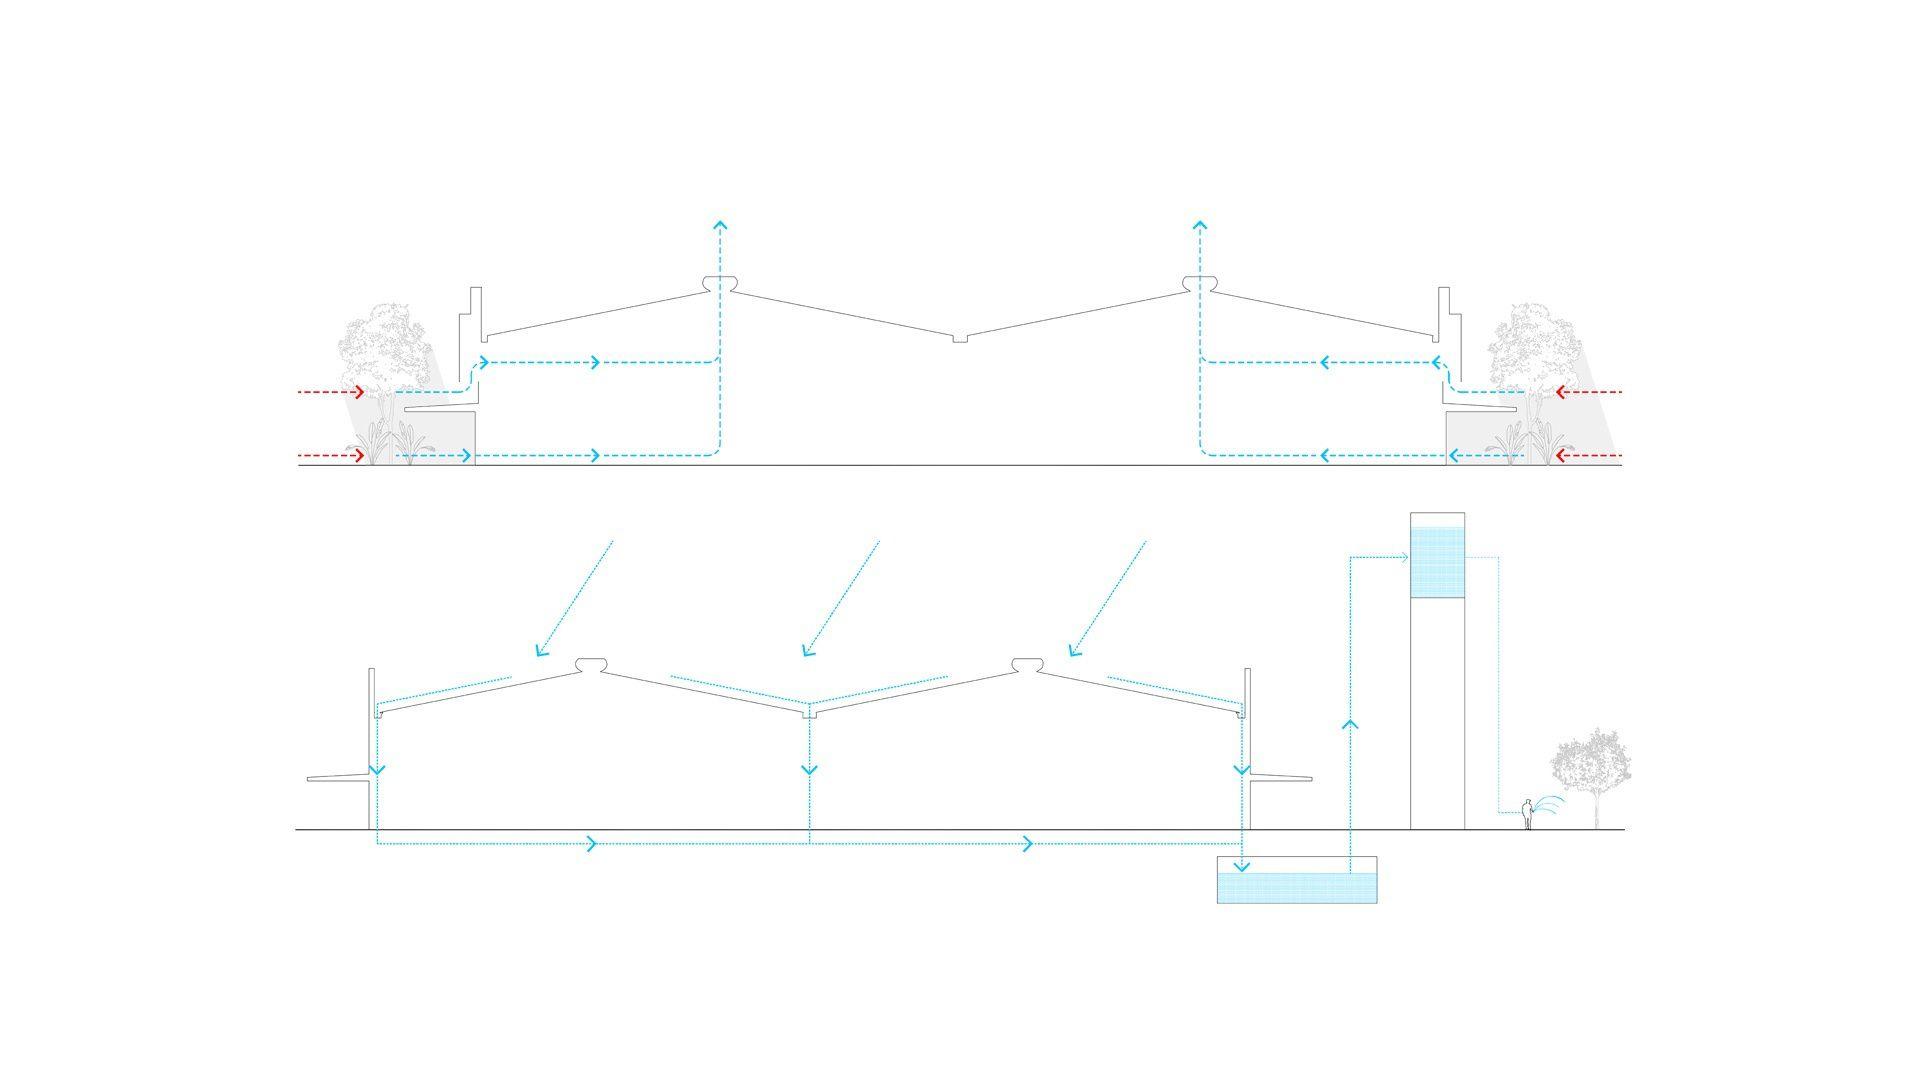 bela-serra-diagrama-ventilacao-natural